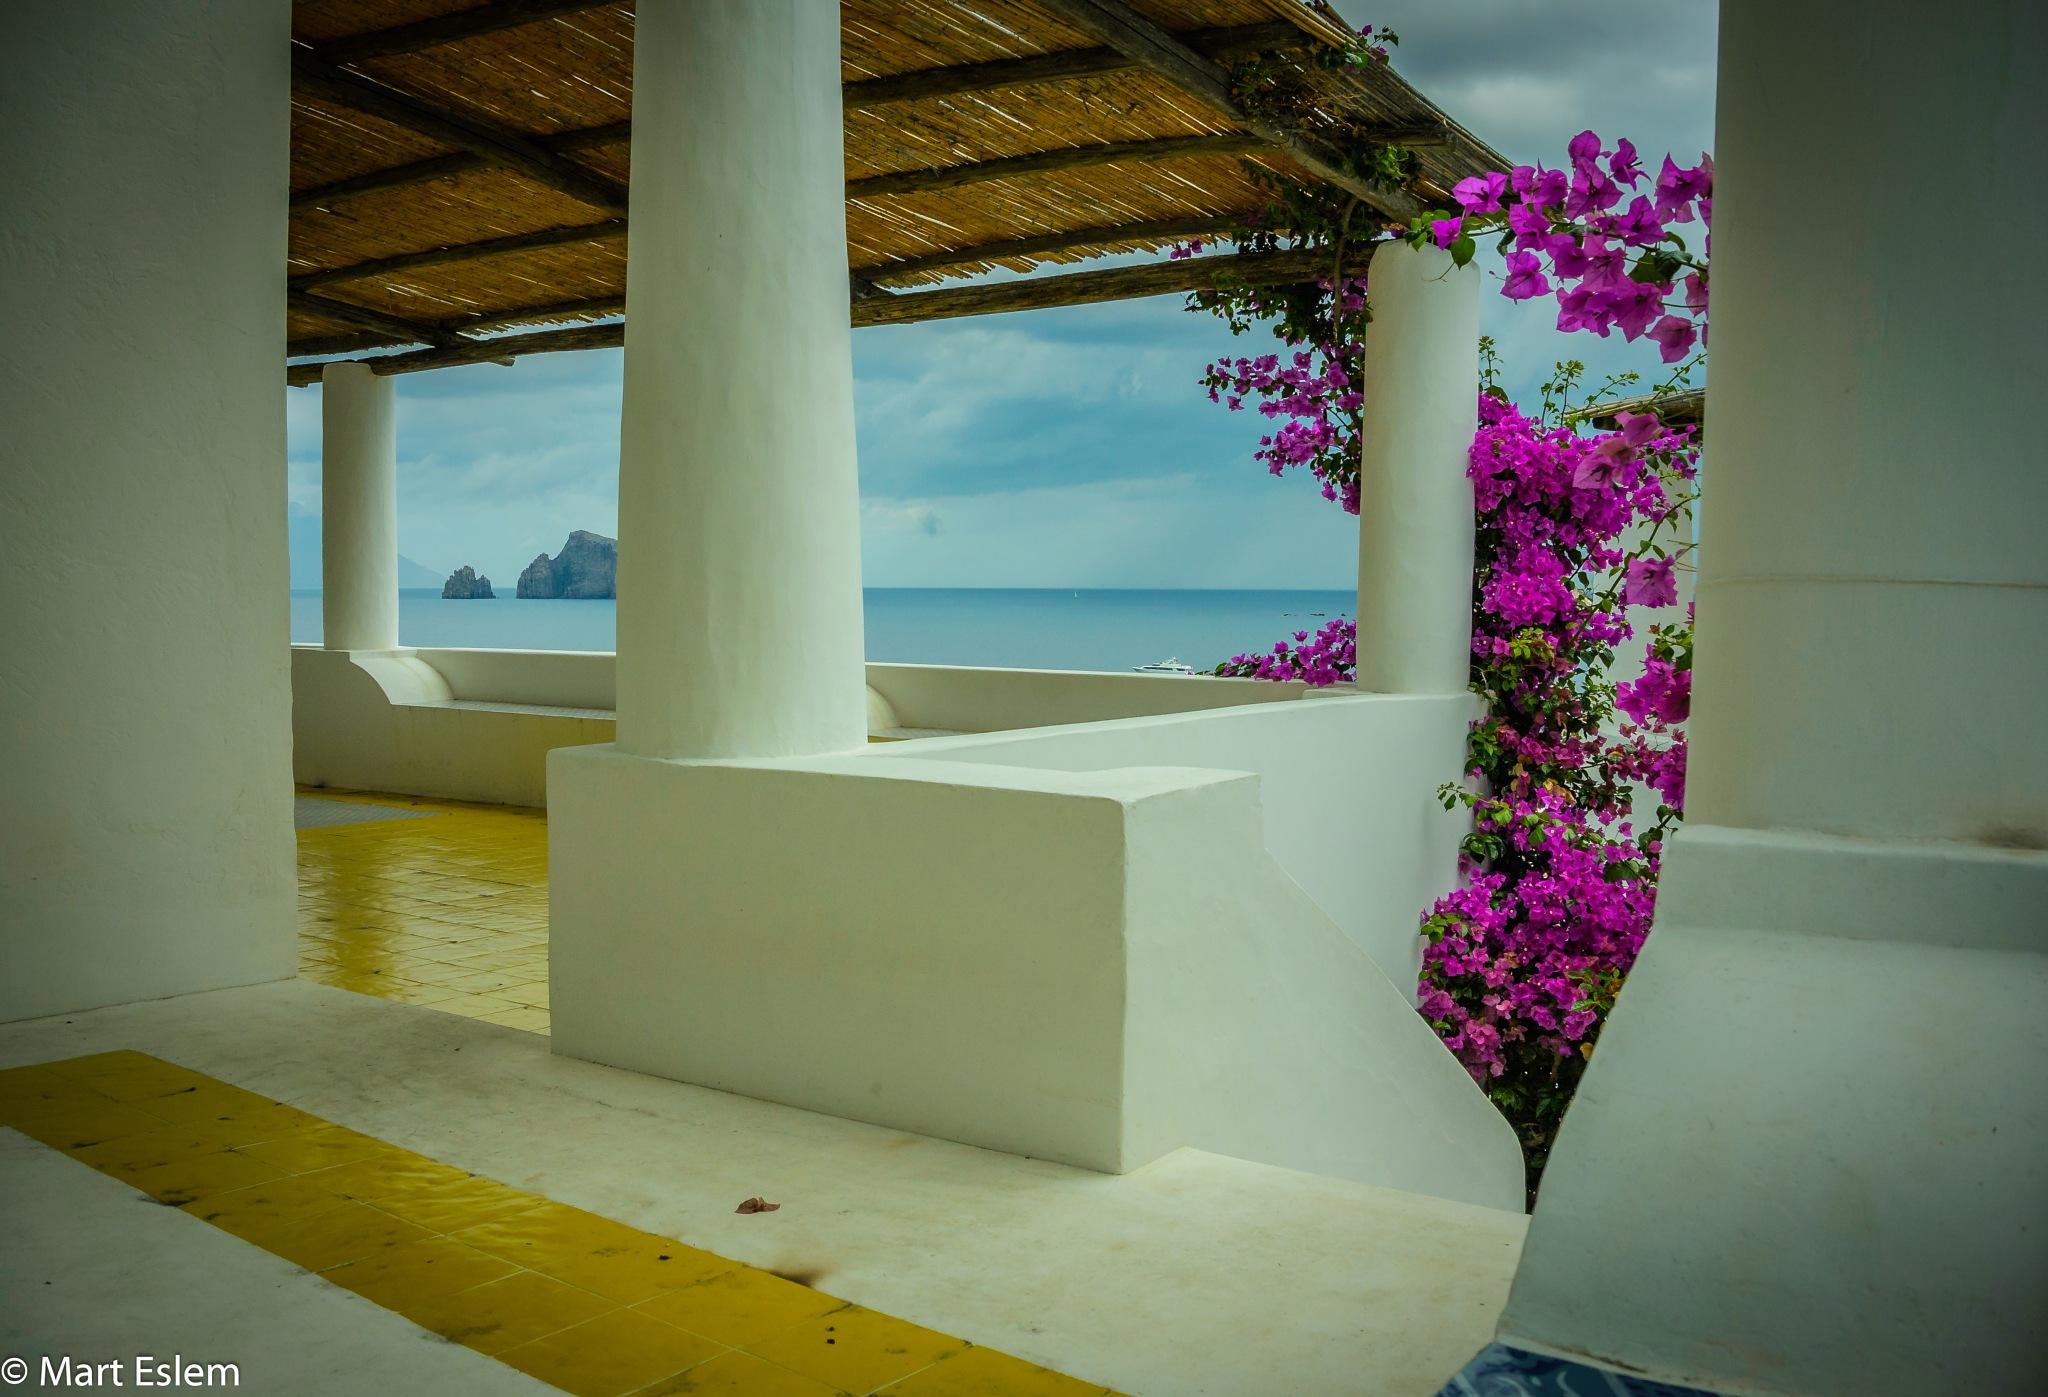 House on Panarea Island by Mart Eslem